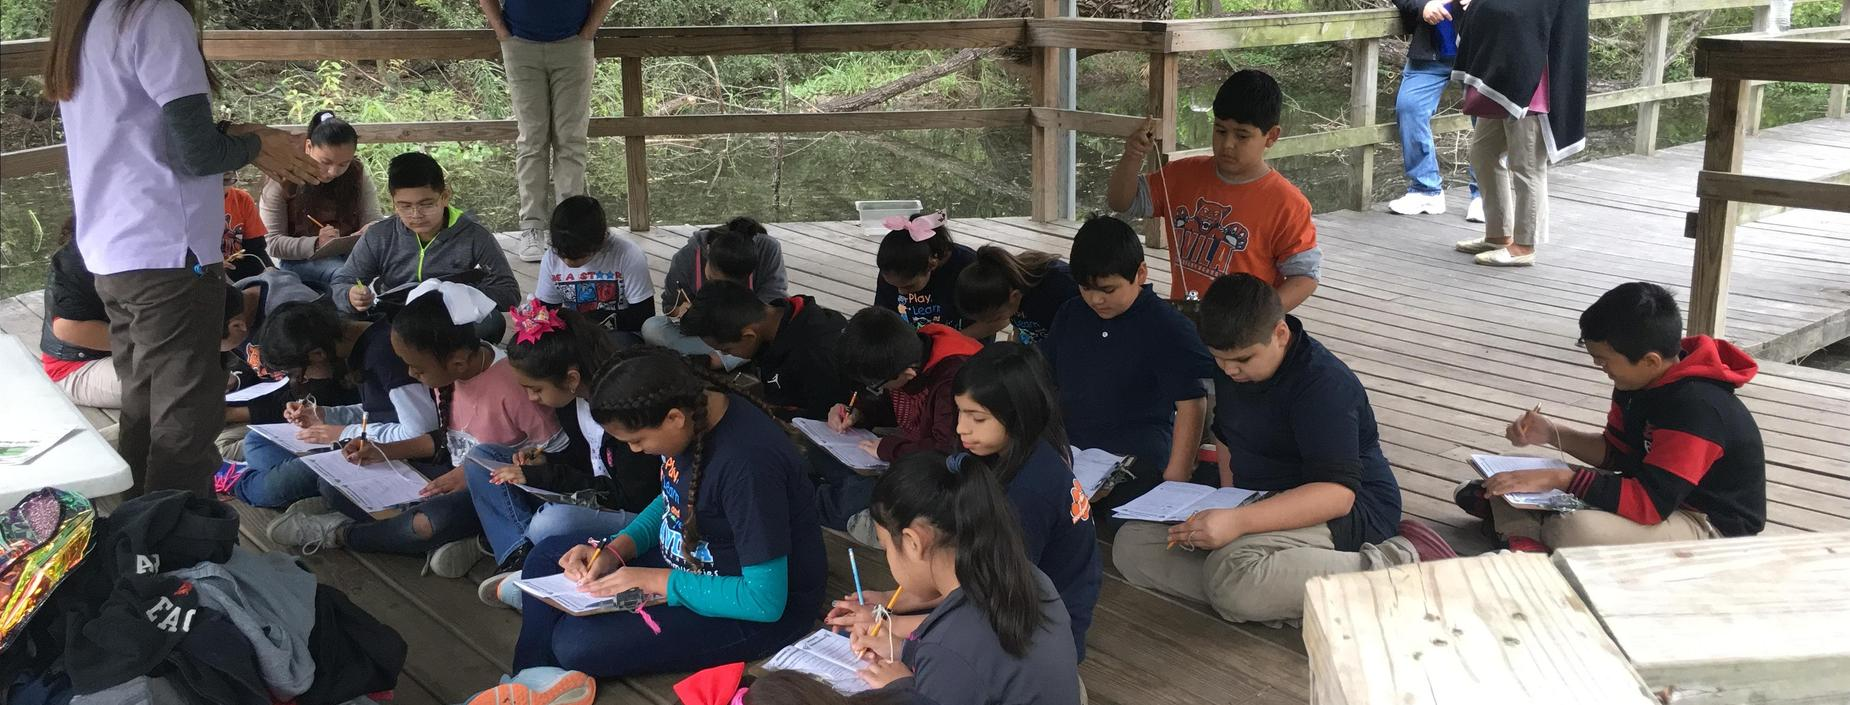 5th grade wetlands science field trip